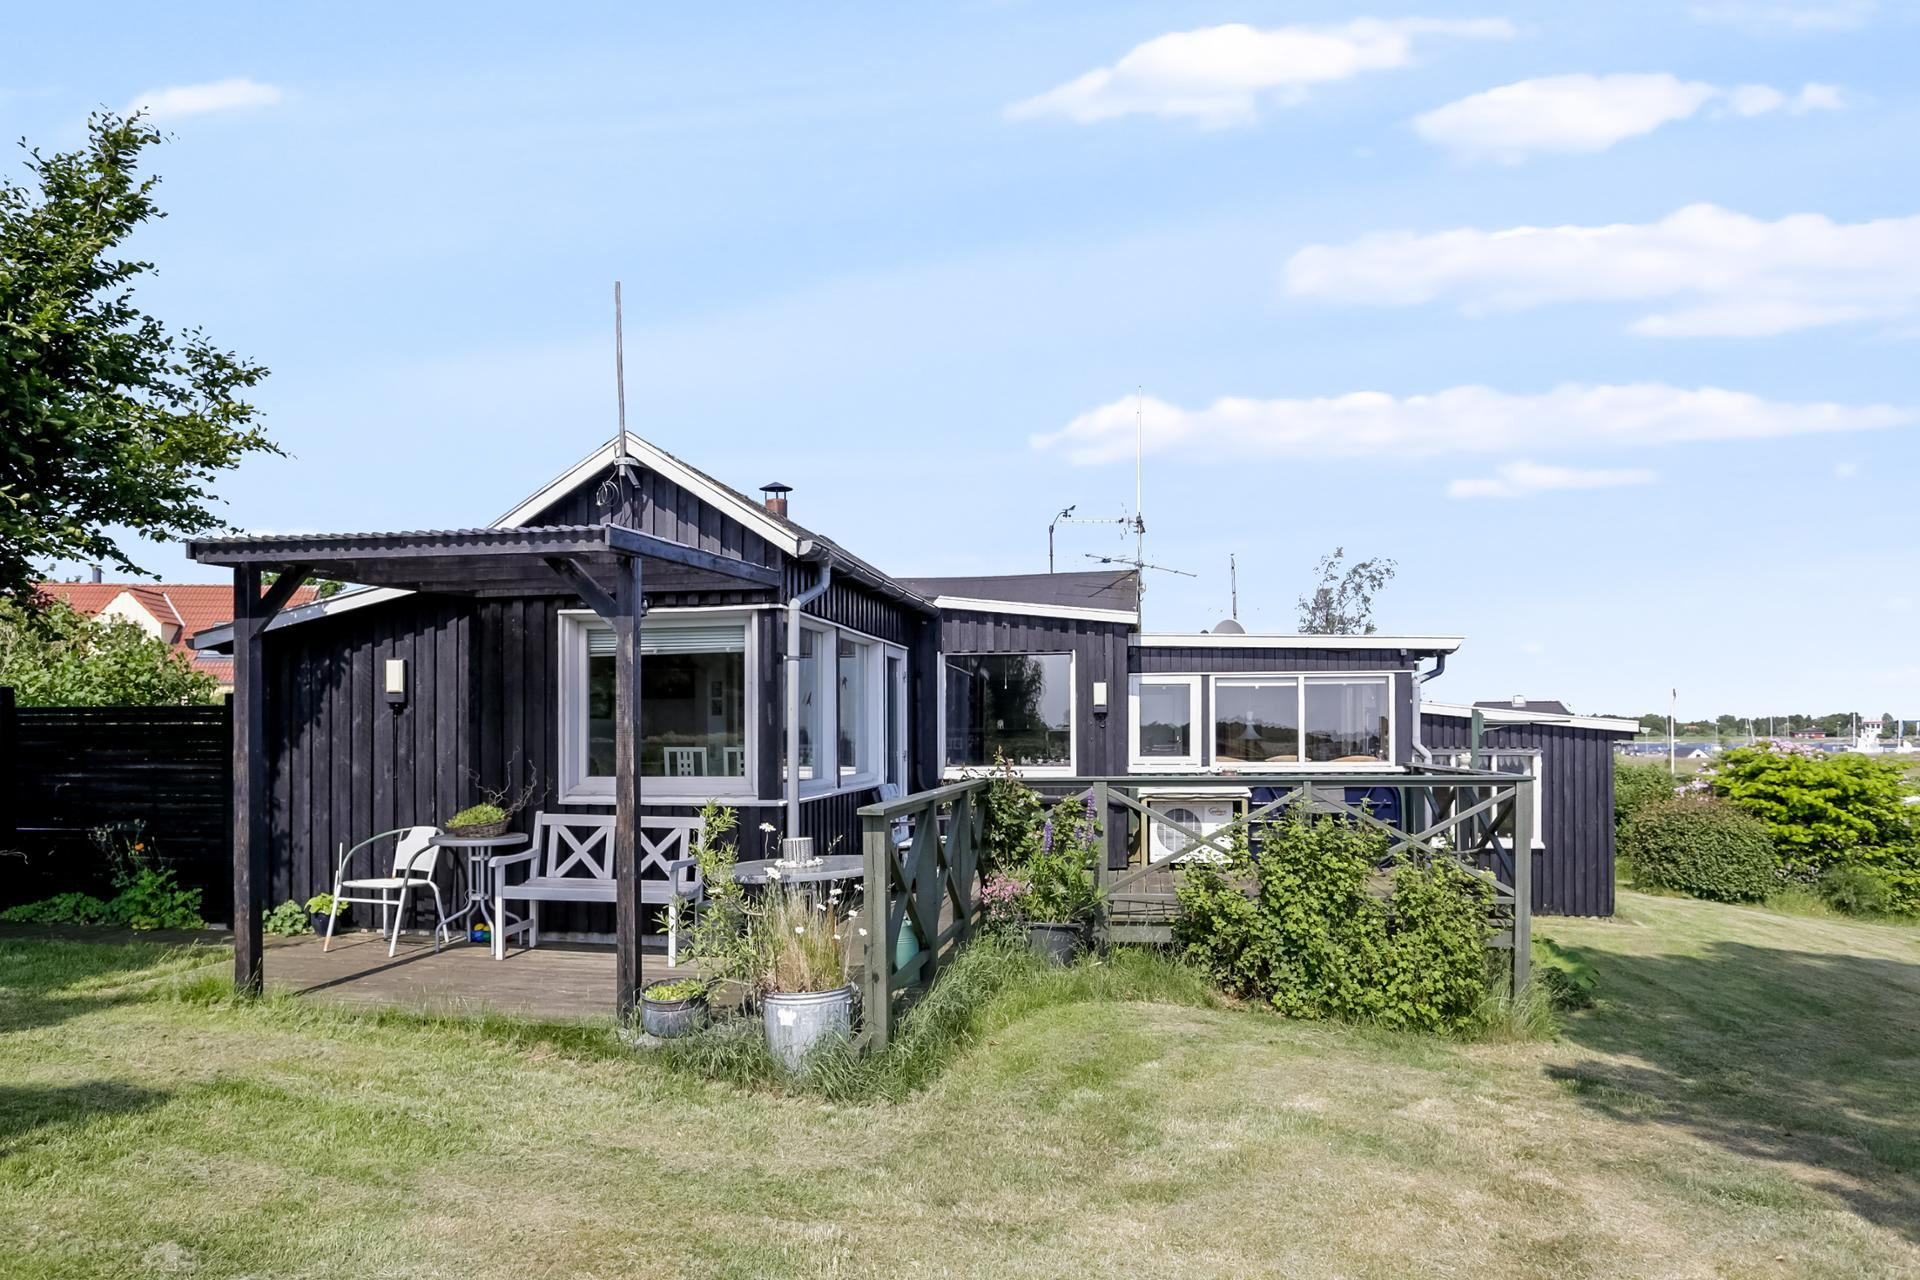 Rougsøvej 328, Udbyhøj Syd, 8950 Ørsted